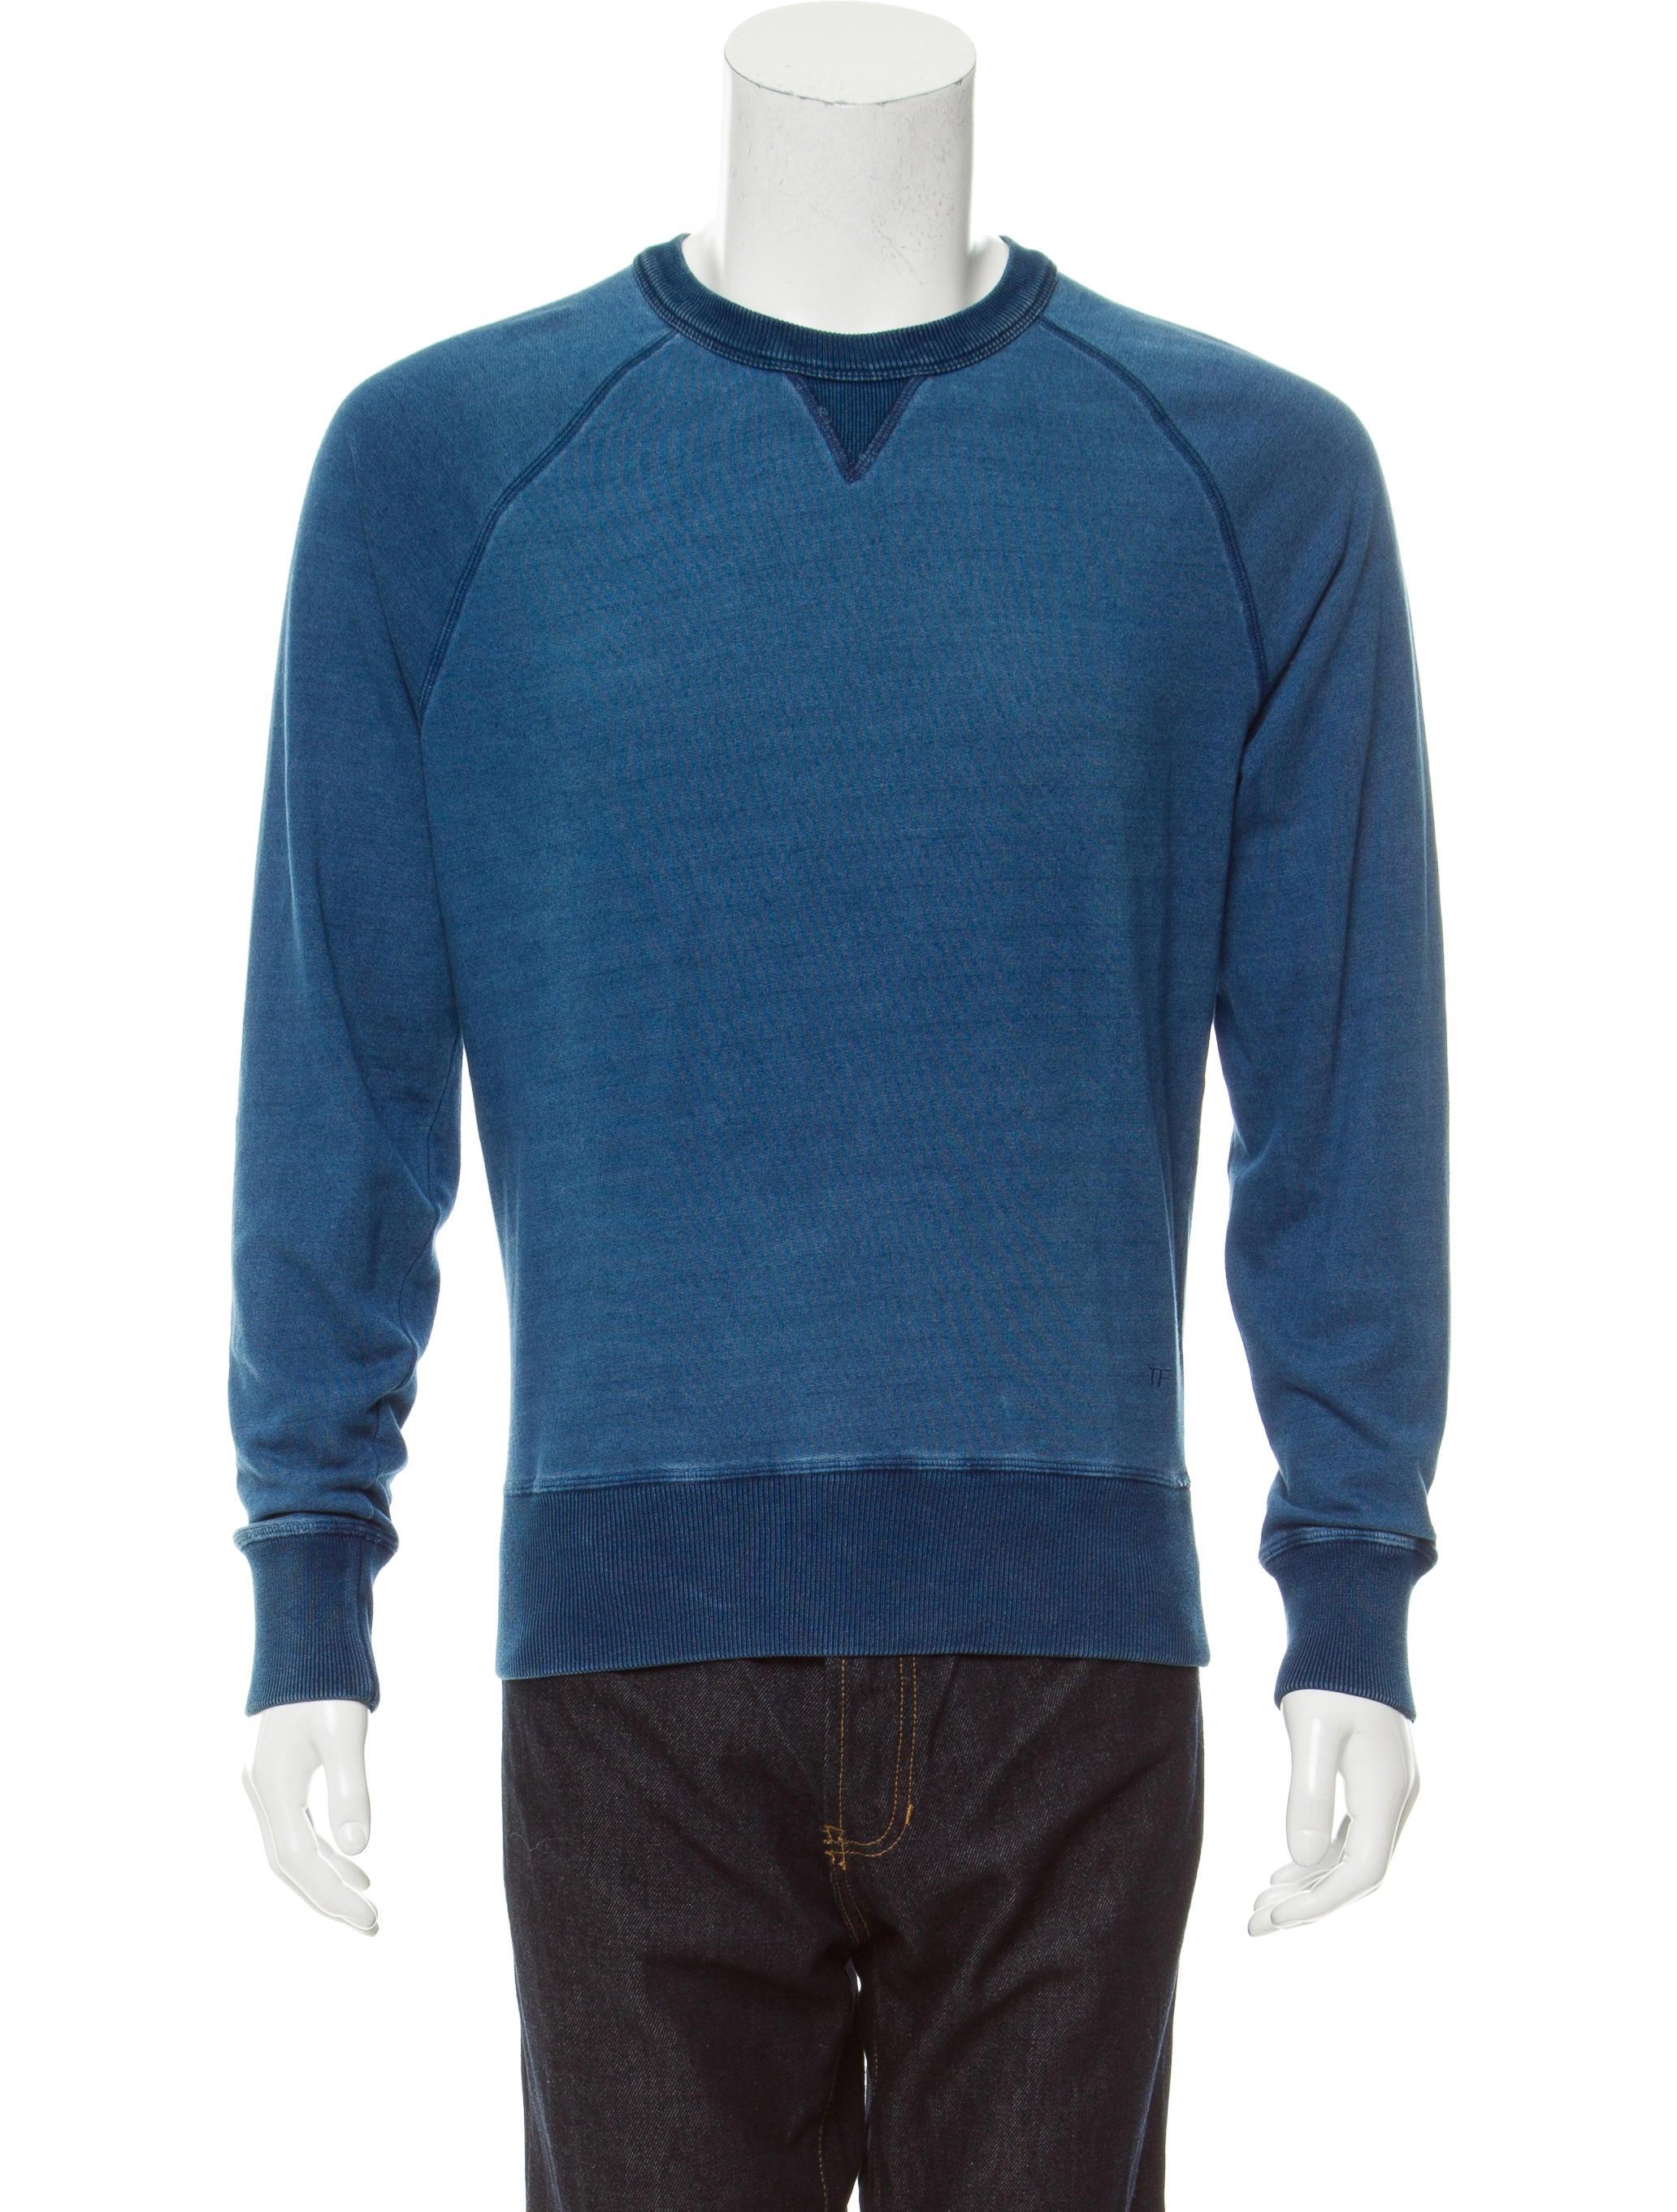 tom ford pullover crew neck sweatshirt clothing. Black Bedroom Furniture Sets. Home Design Ideas